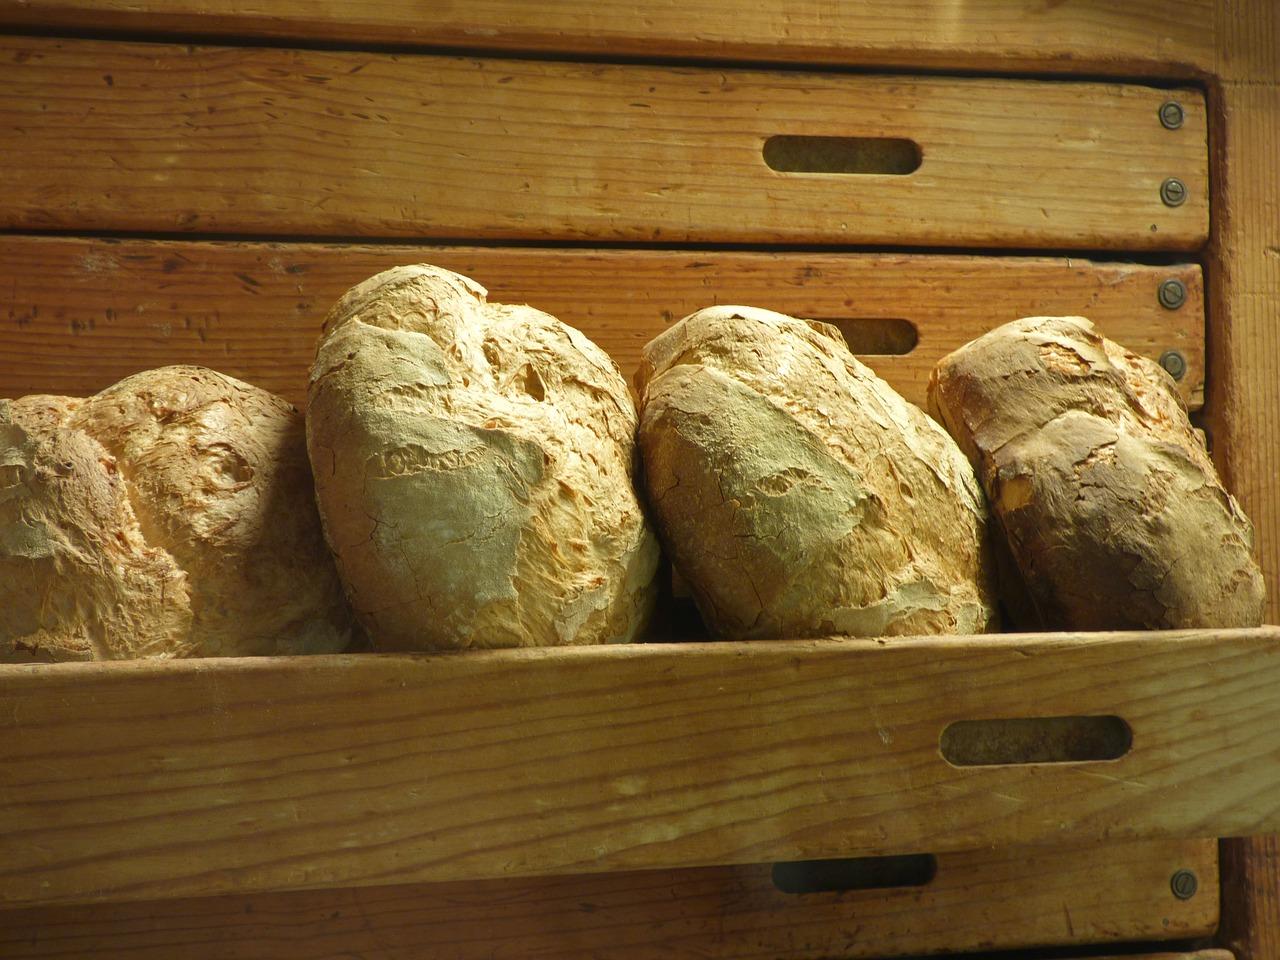 receptura na chleb wiejski